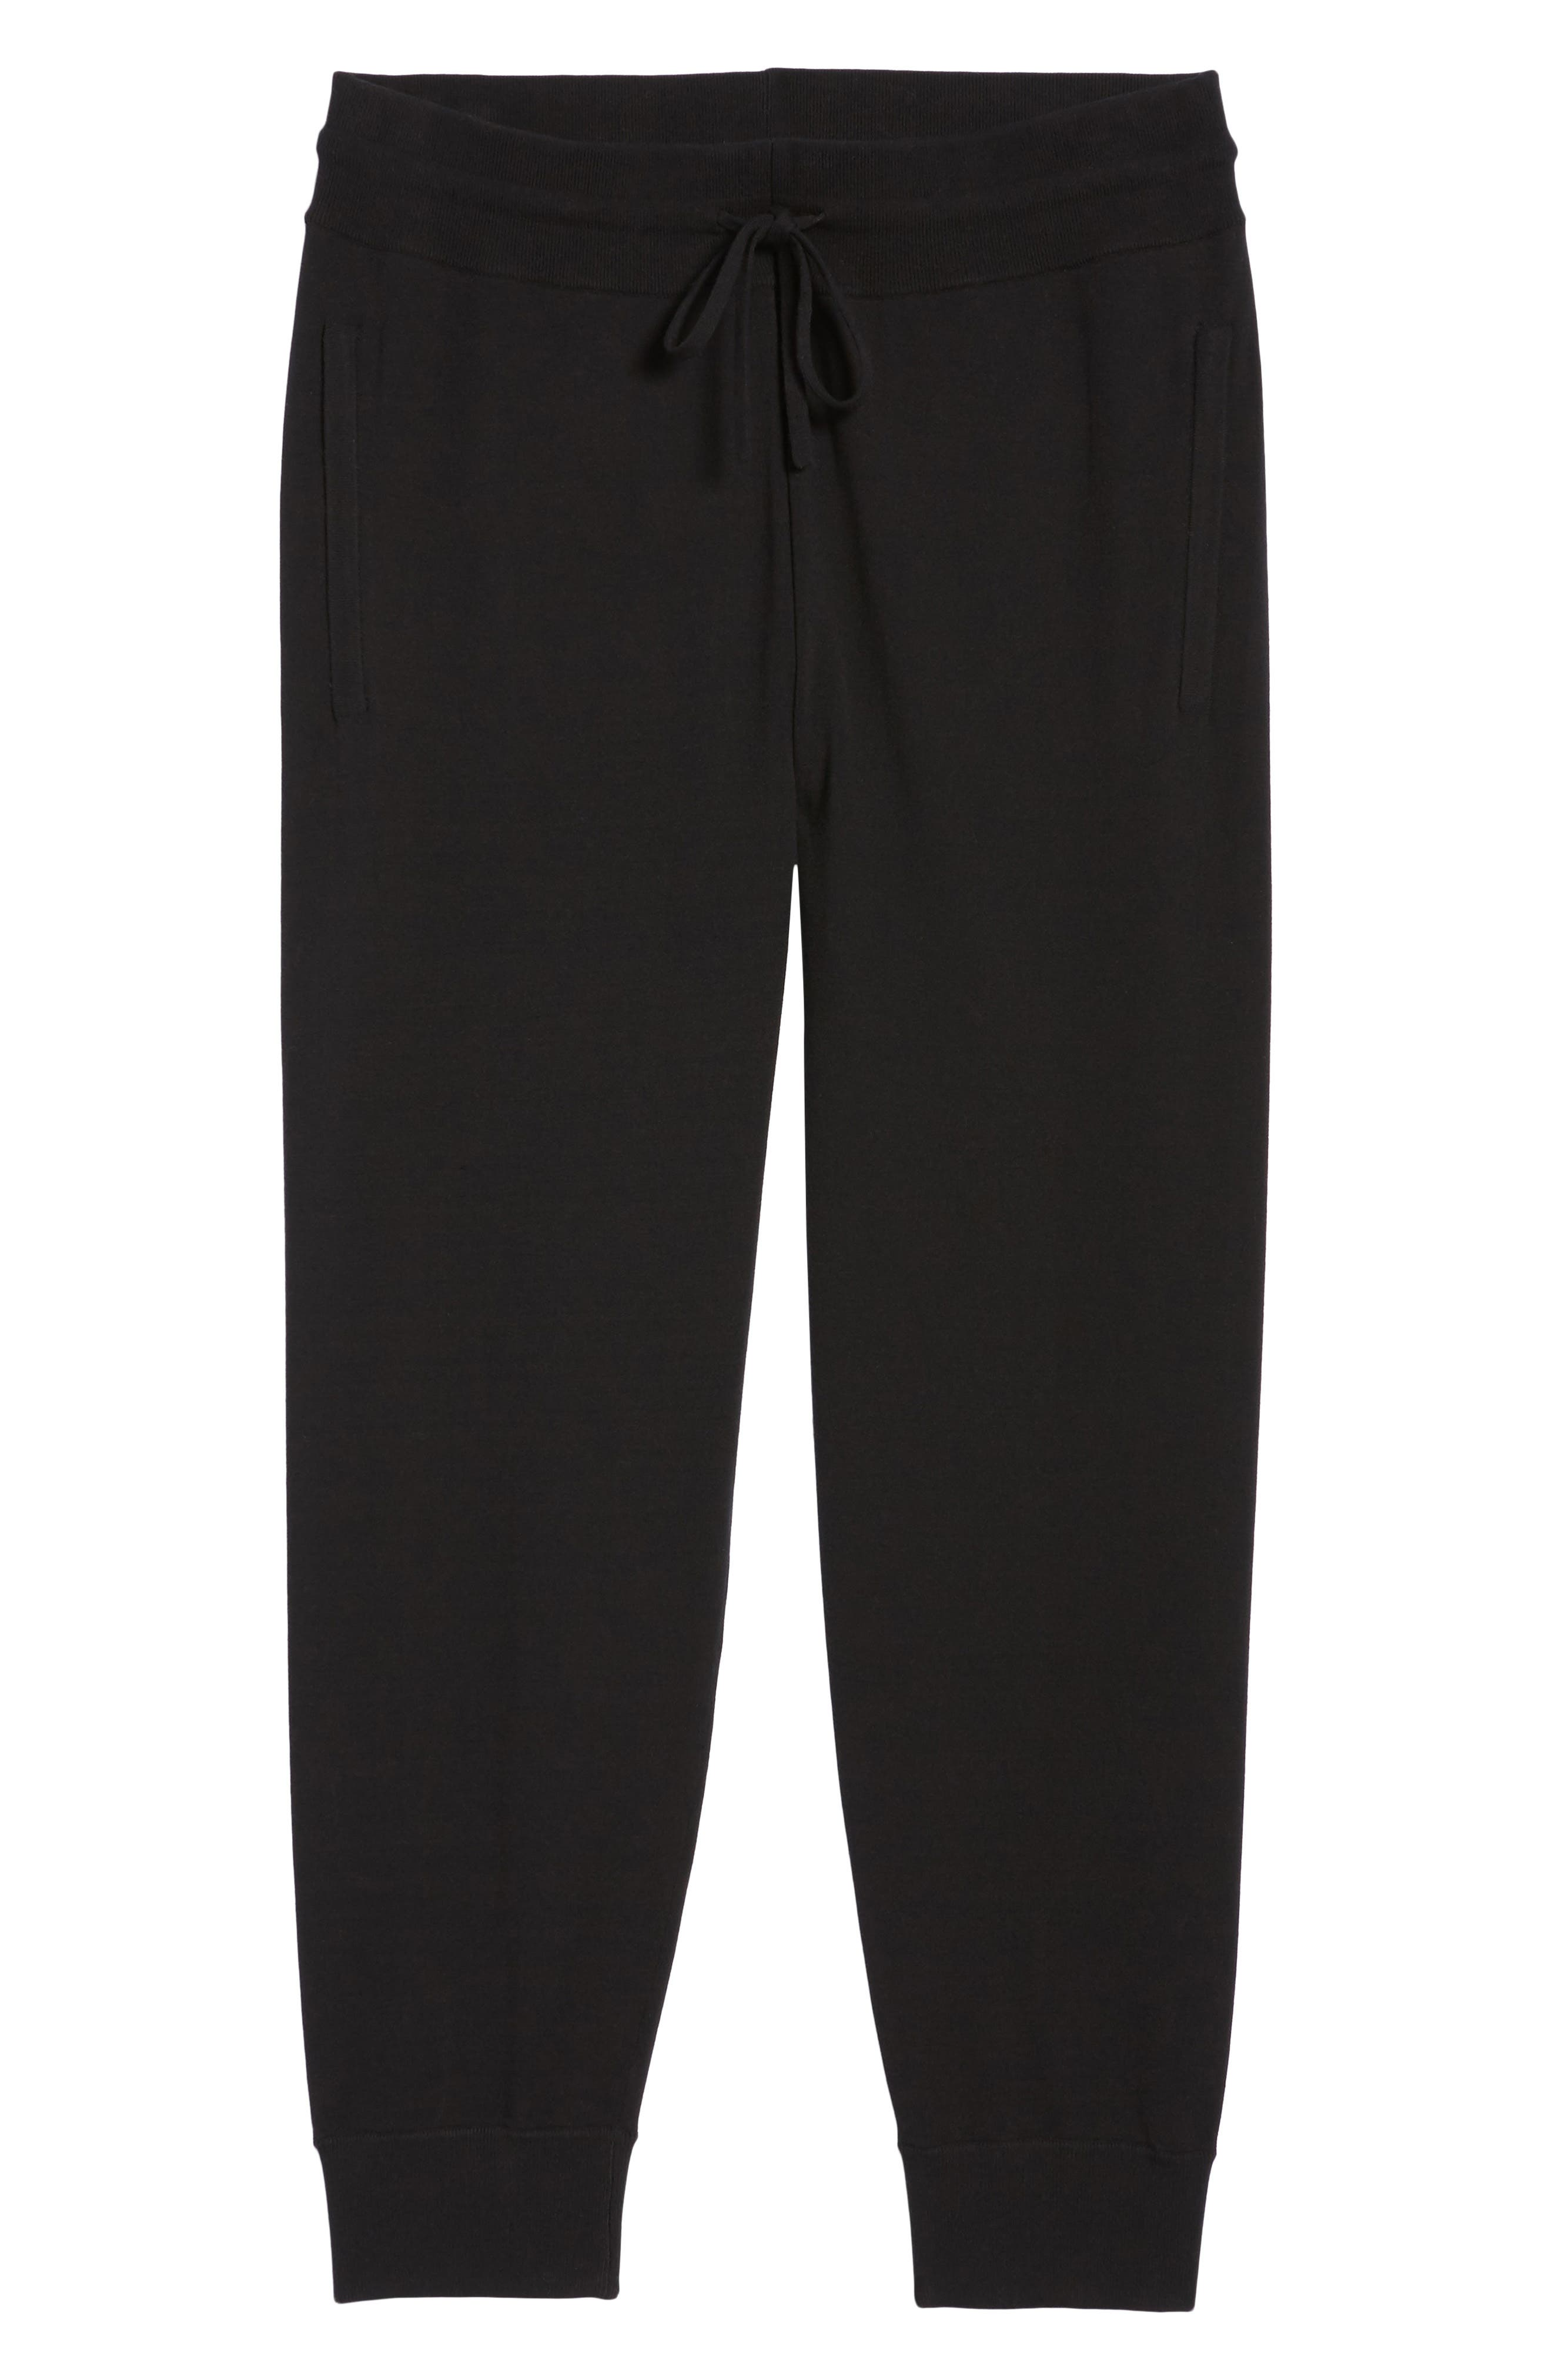 Slim Fit Jogger Pants,                             Alternate thumbnail 6, color,                             Black